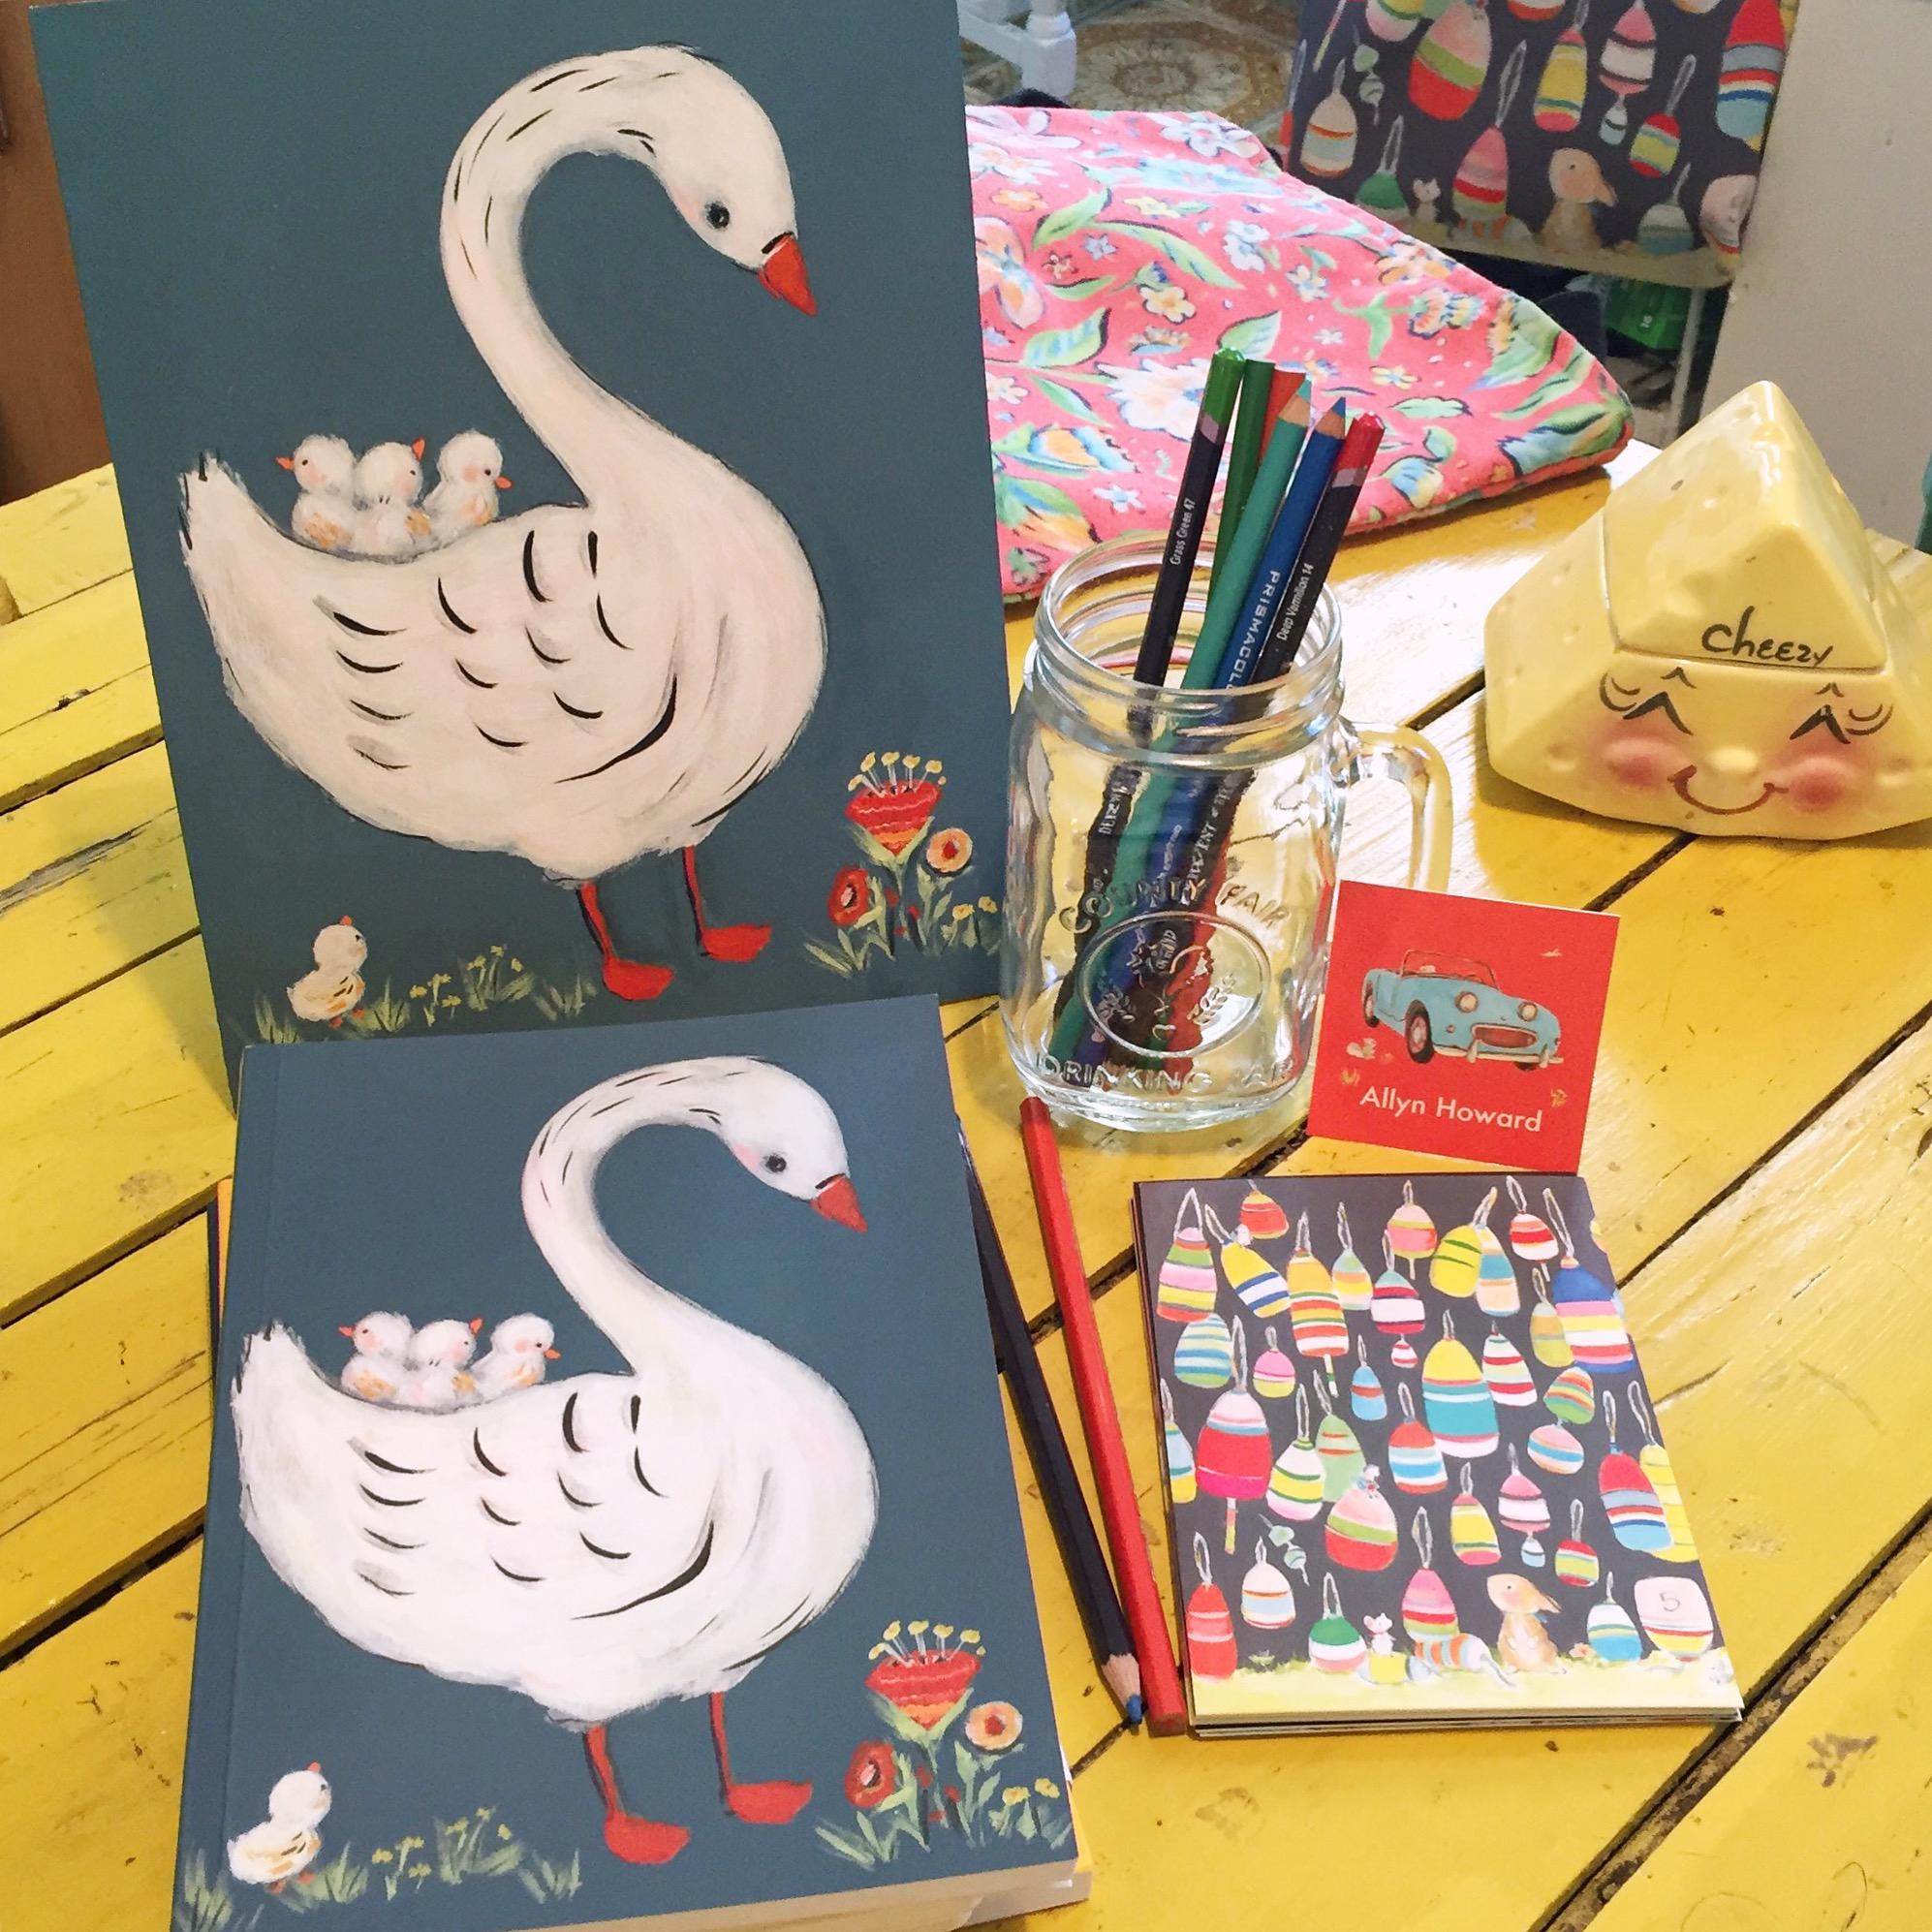 Allyn_Howard_Swan_notebooks_bags.jpg